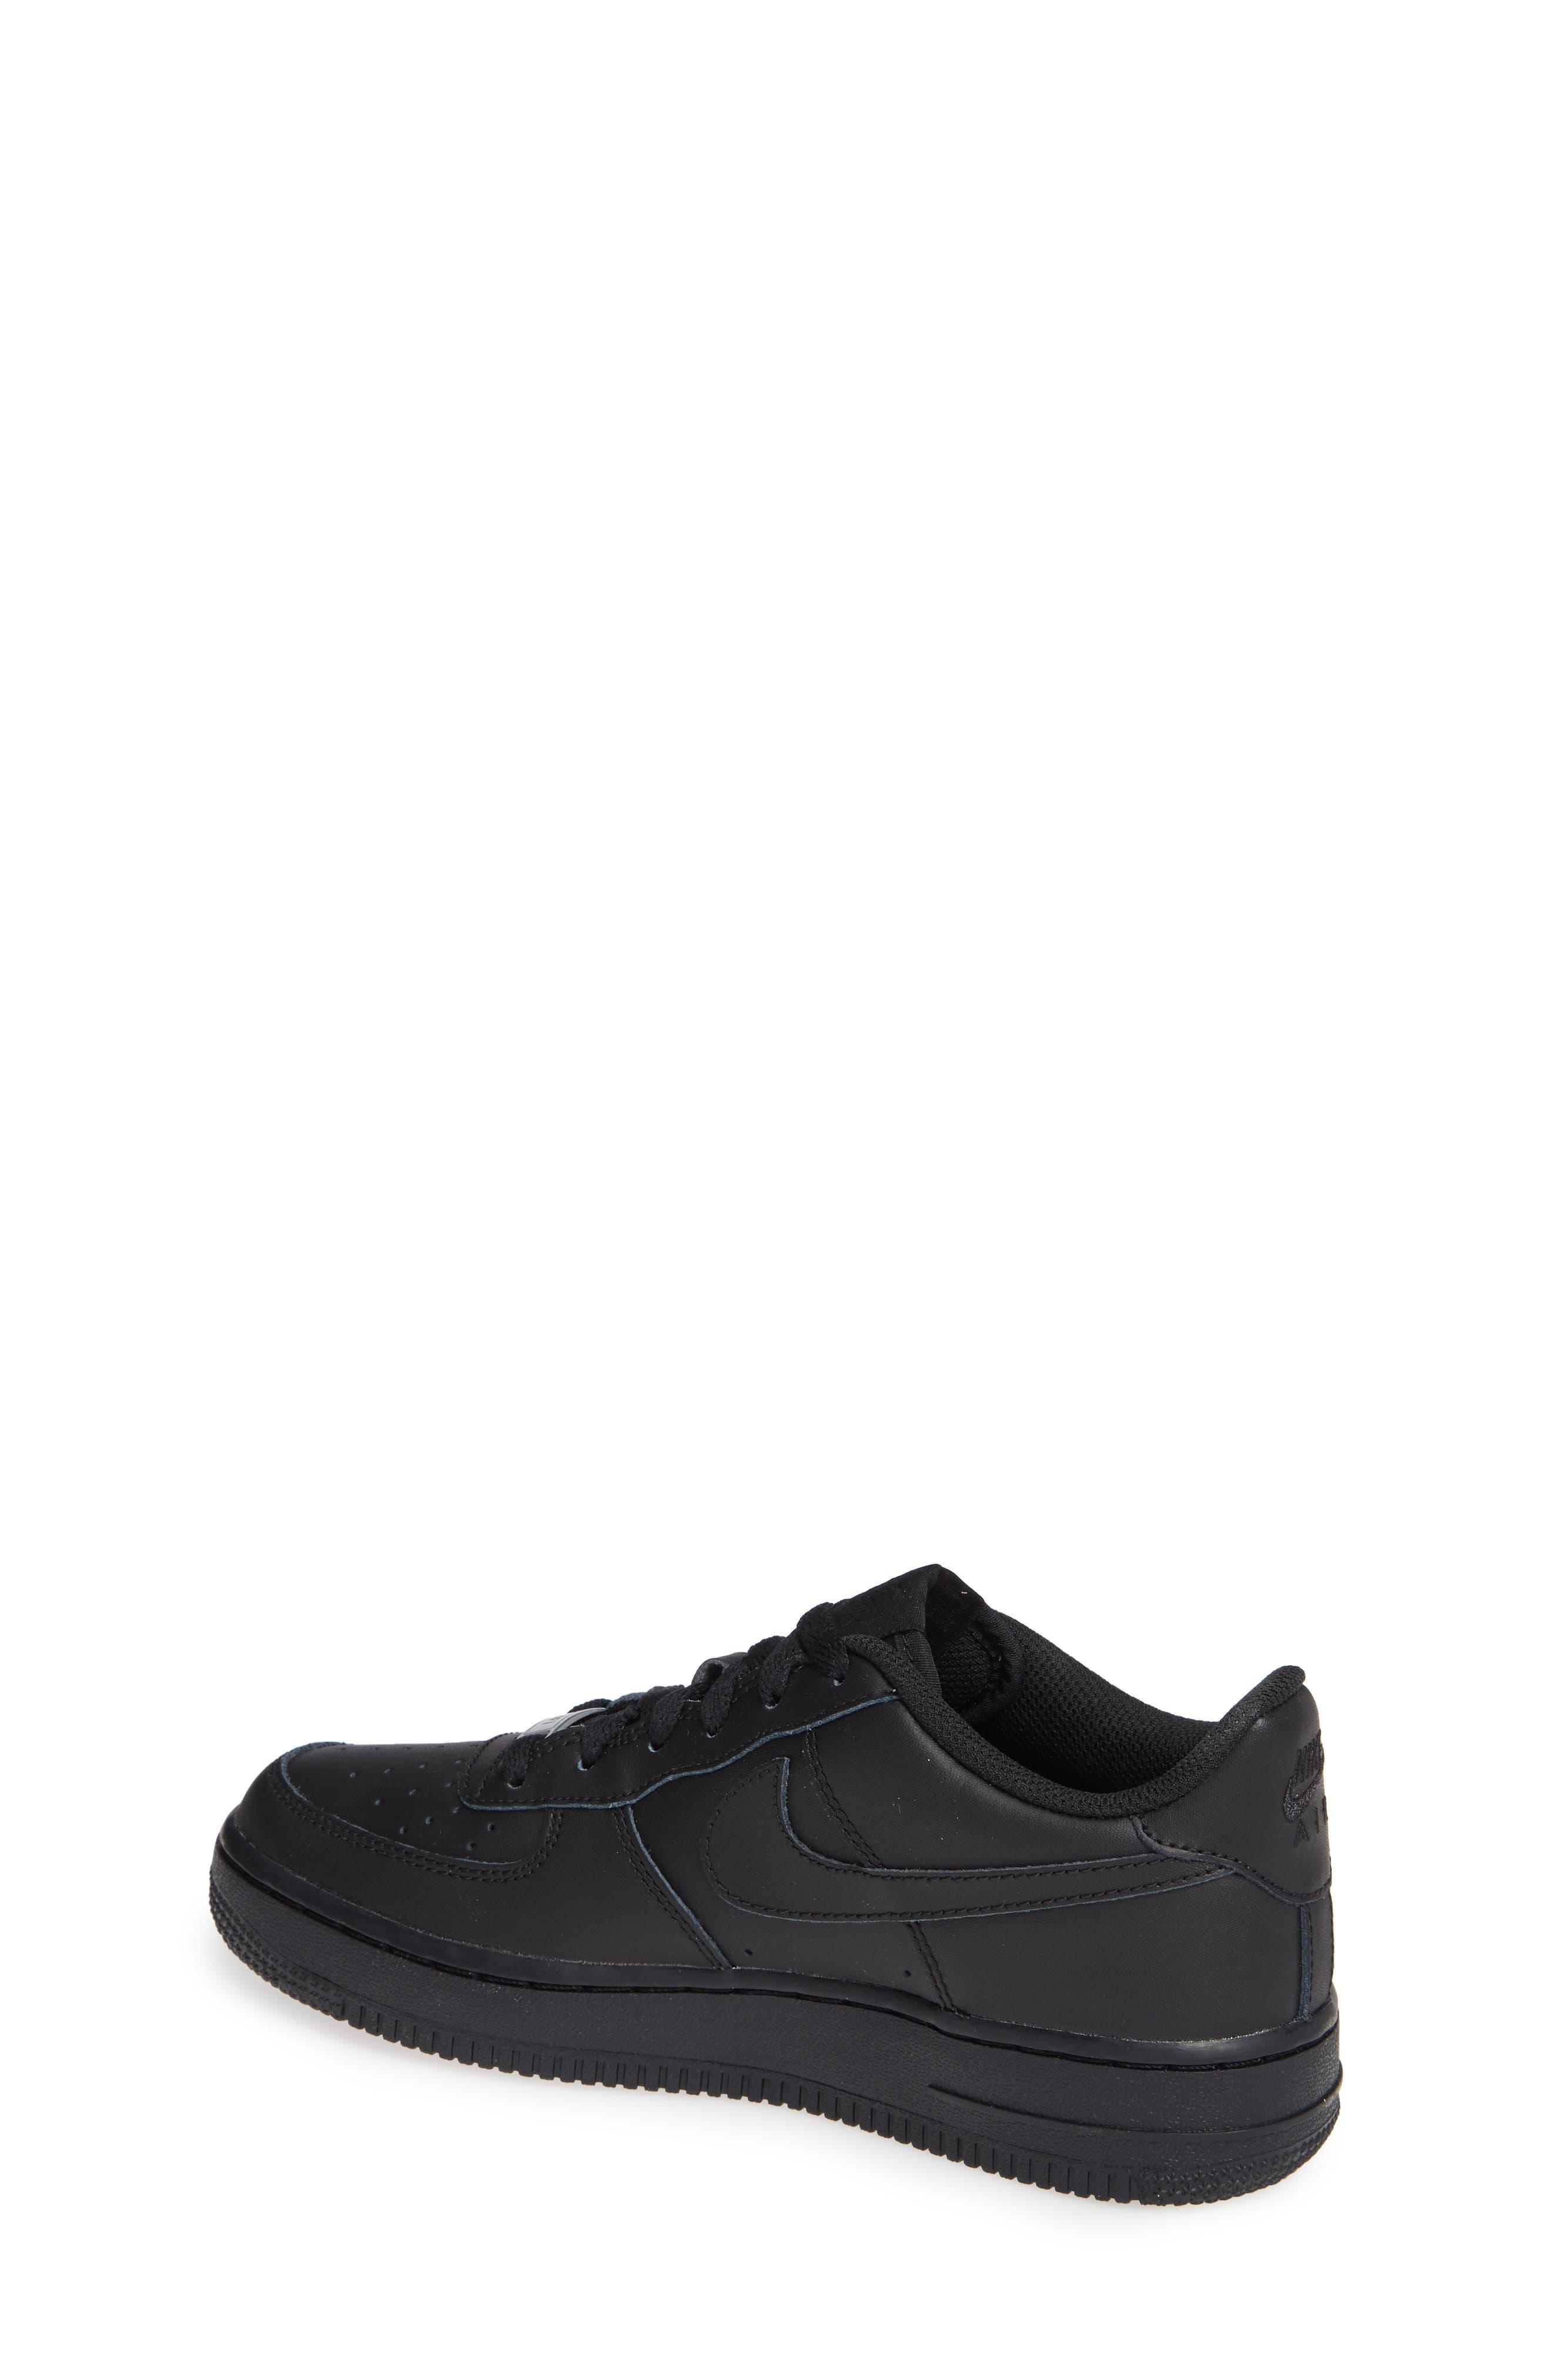 Air Force 1 Sneaker,                             Alternate thumbnail 2, color,                             BLACK/ BLACK/ BLACK